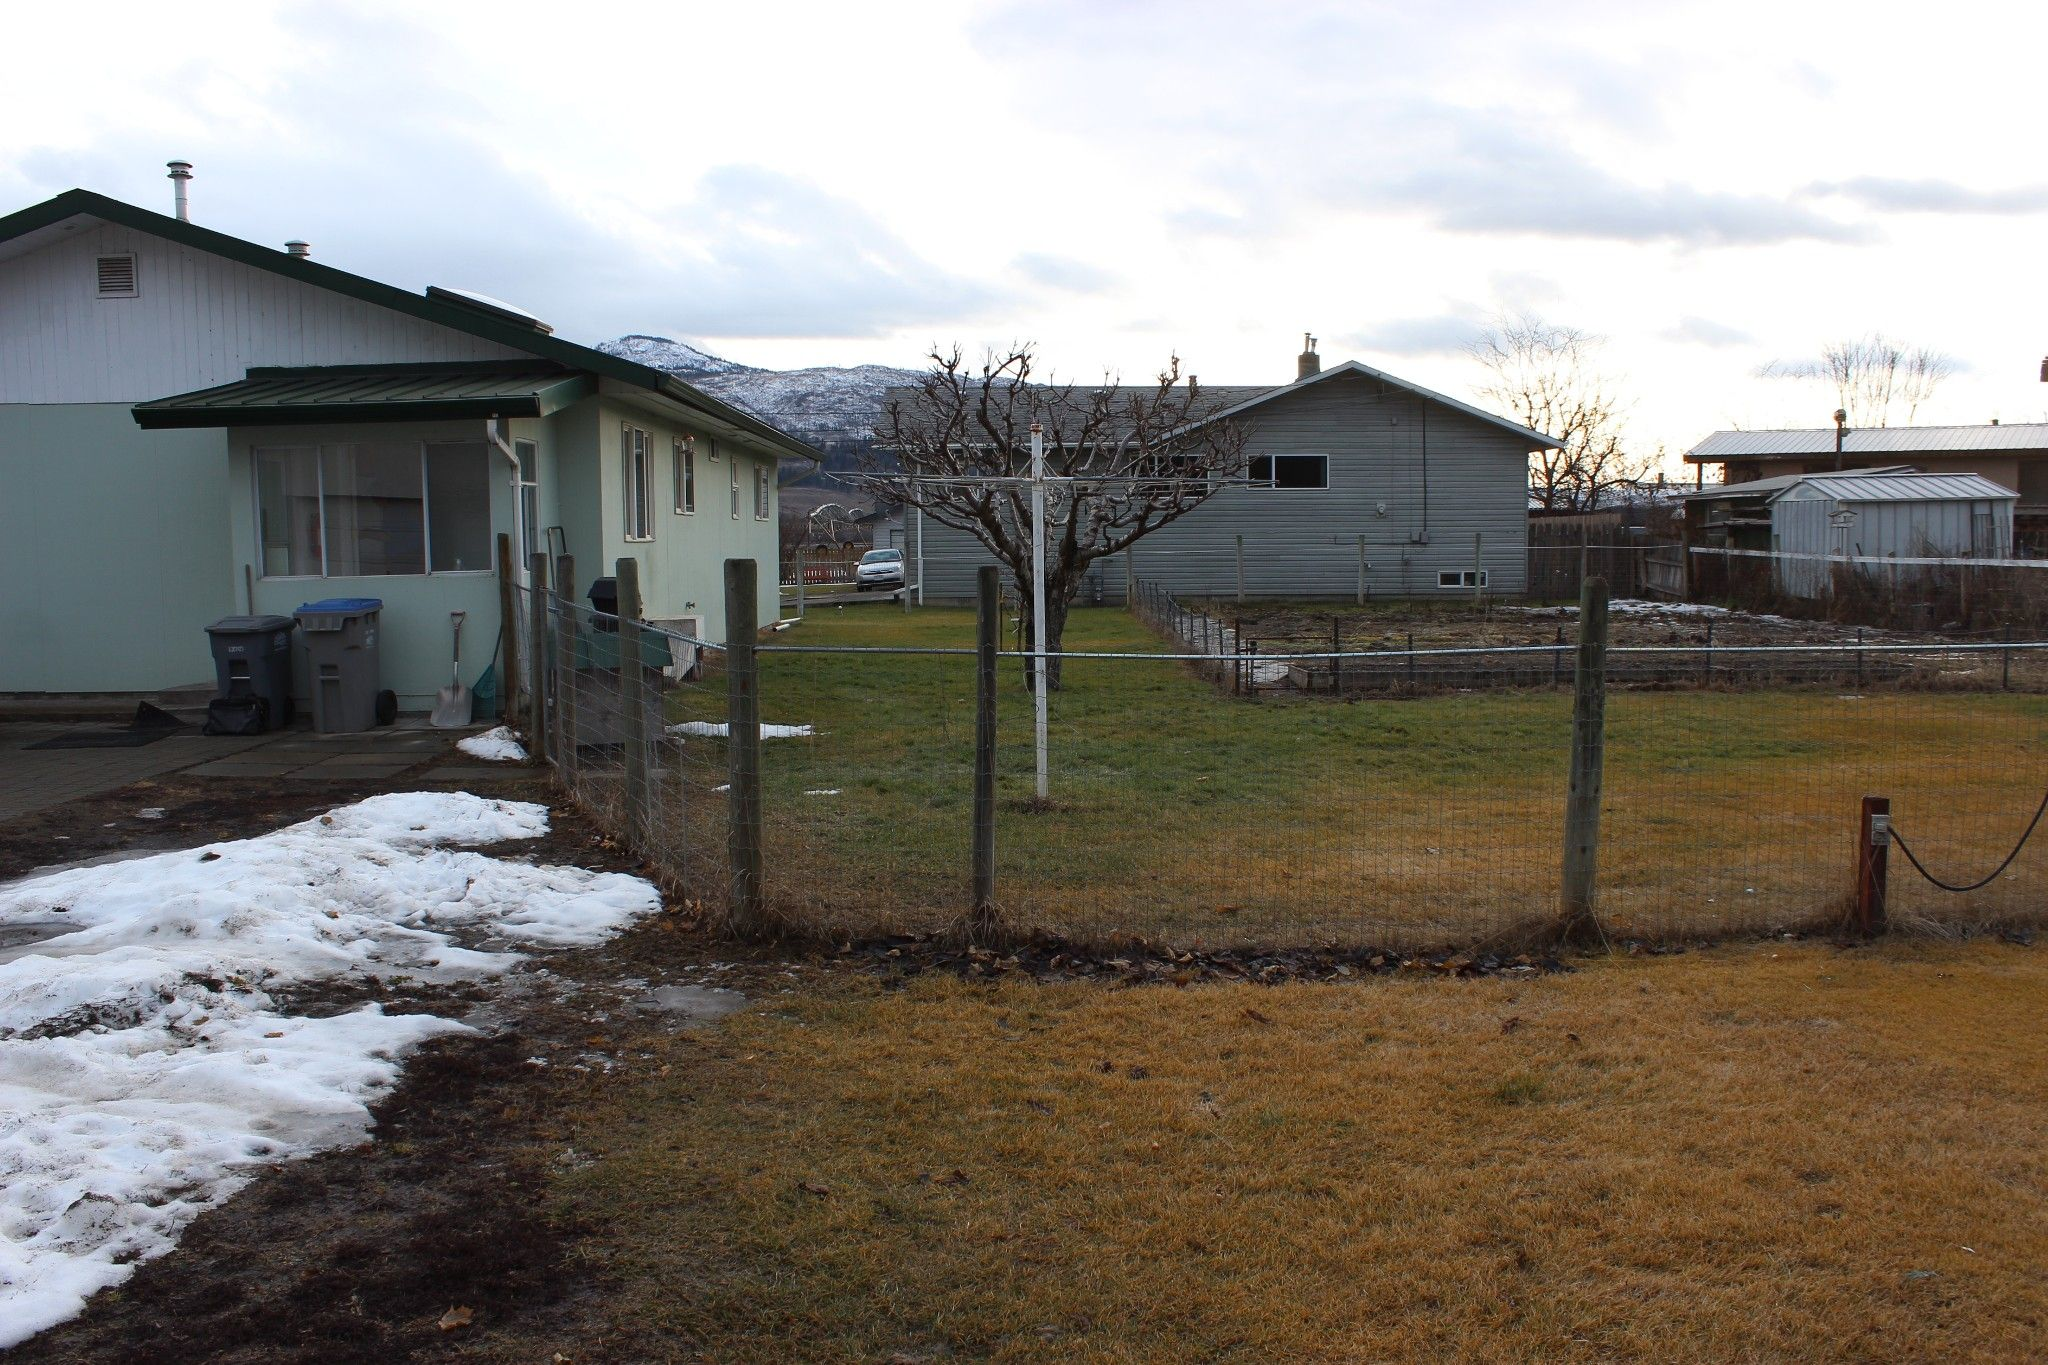 Photo 20: Photos: 6725 Heffley Road in Kamloops: Heffley House for sale : MLS®# 160007